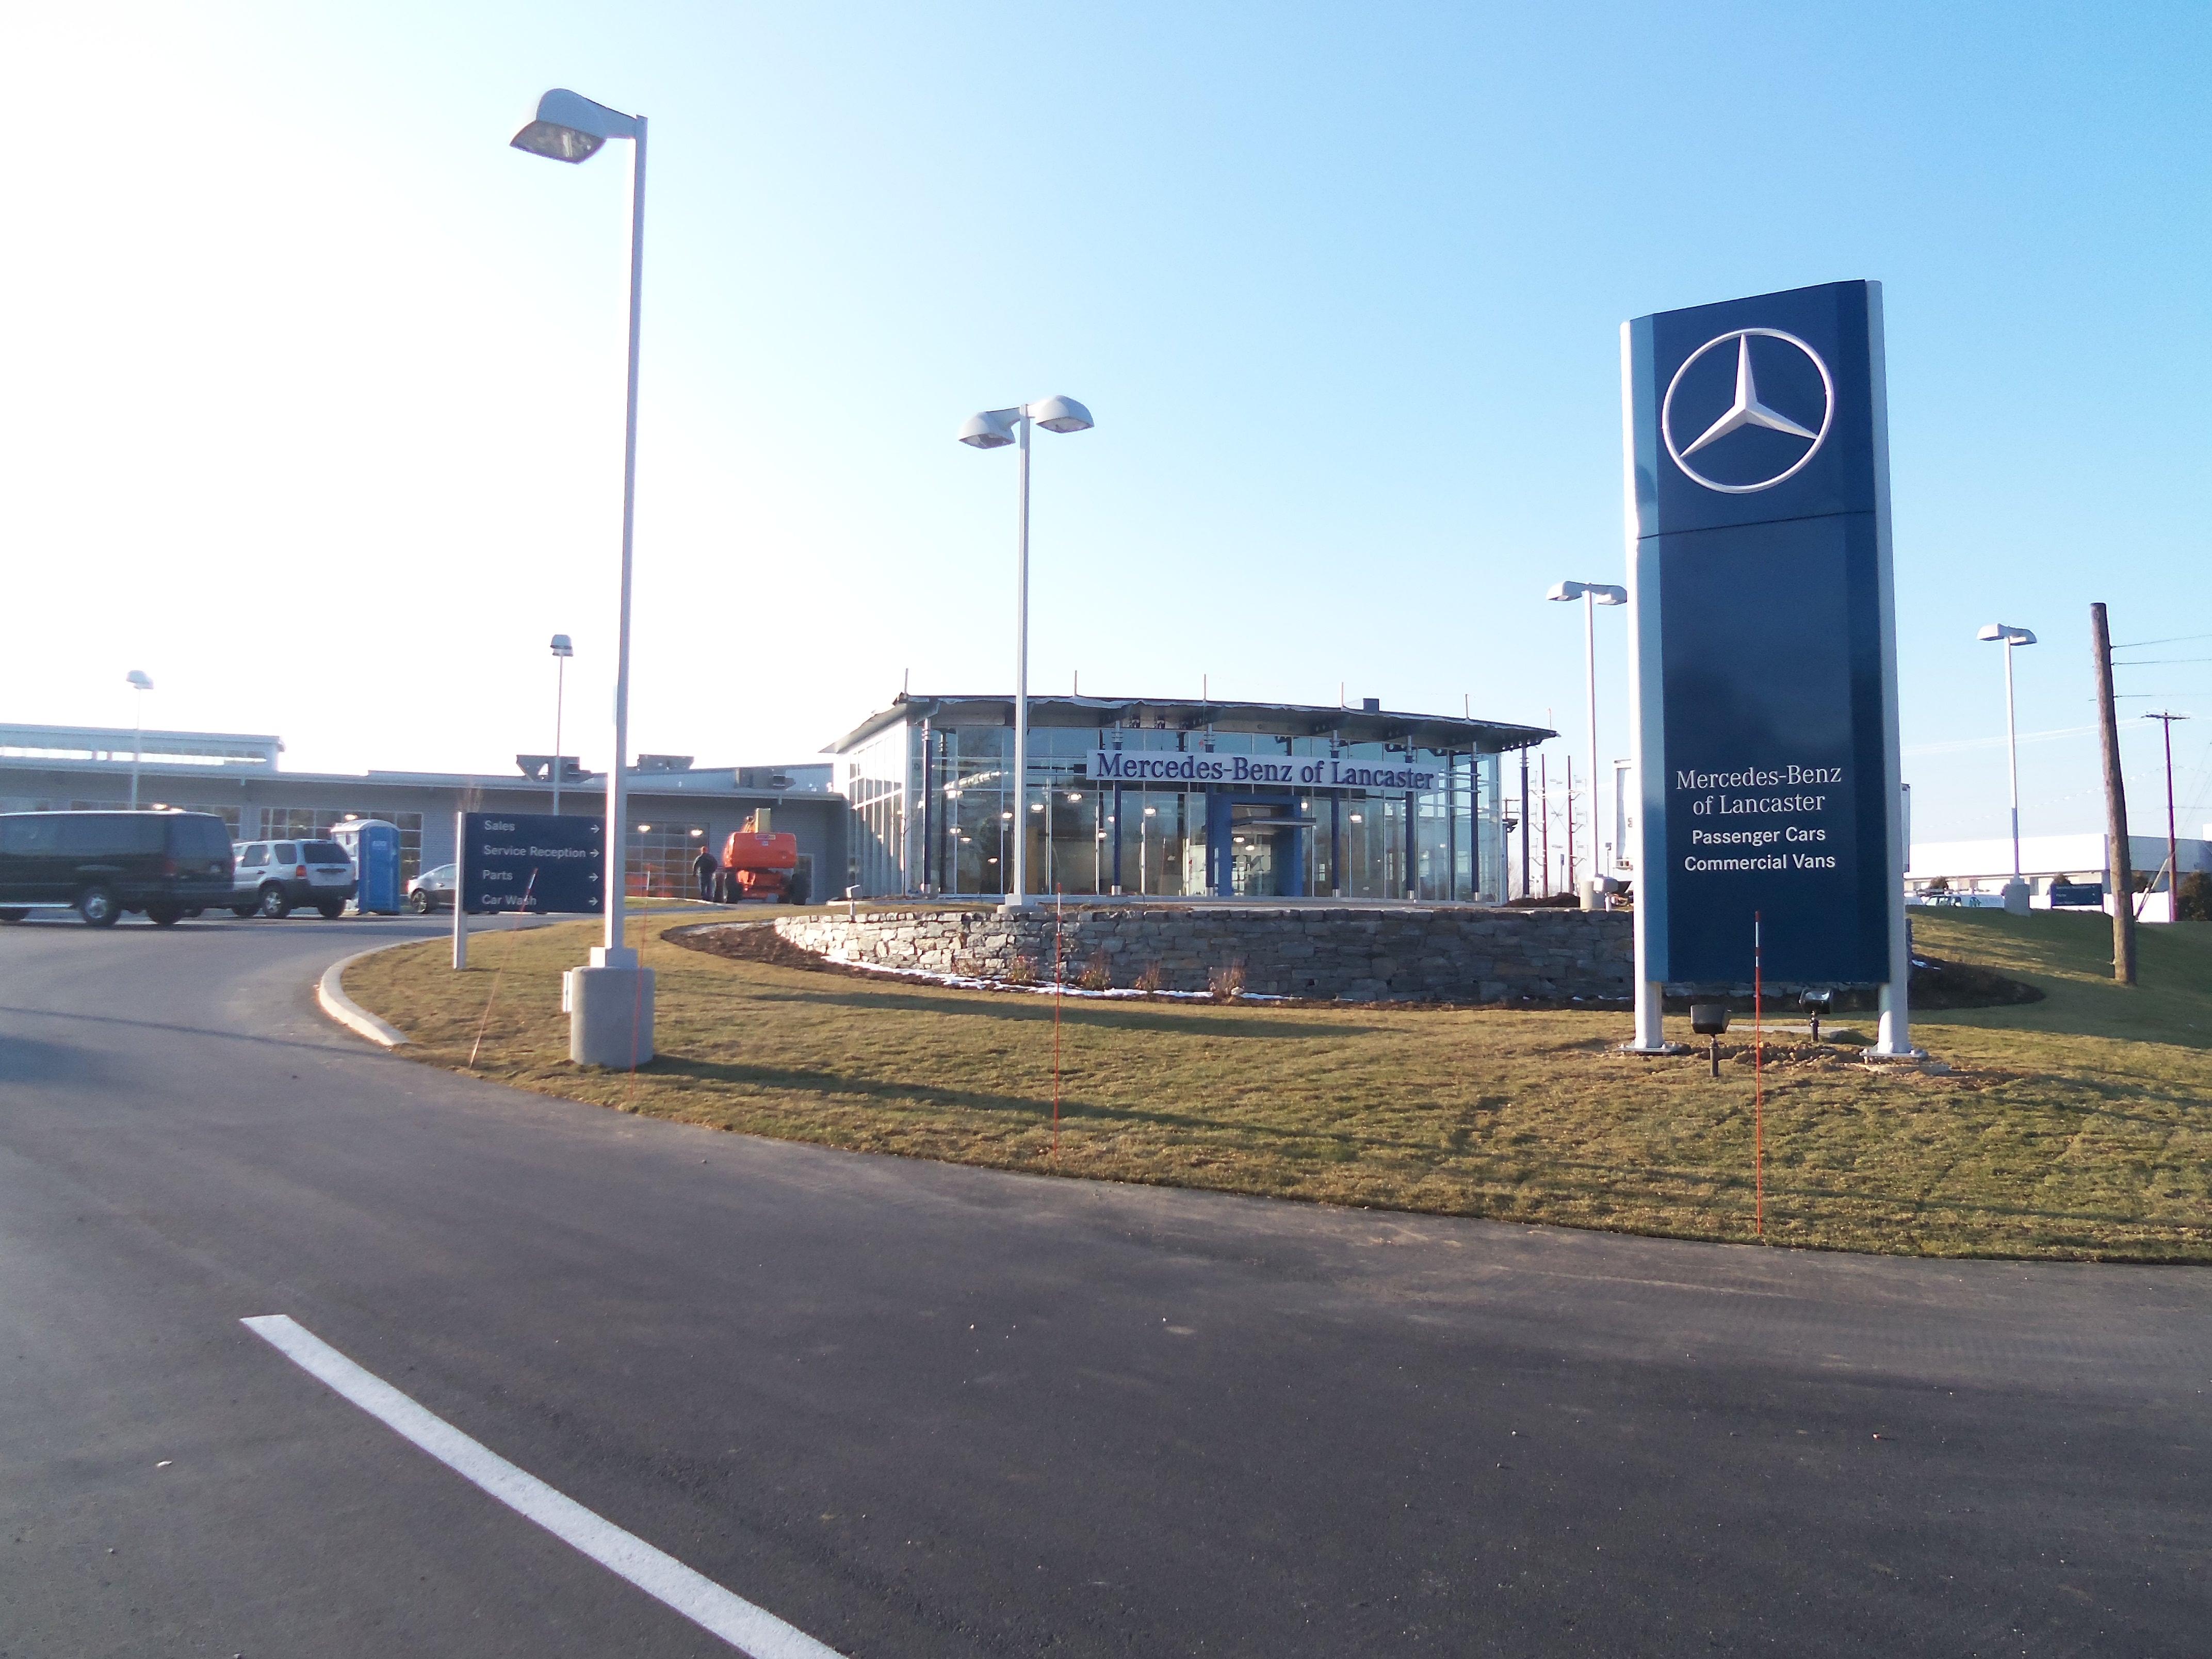 Mercedes Benz of Lancaster